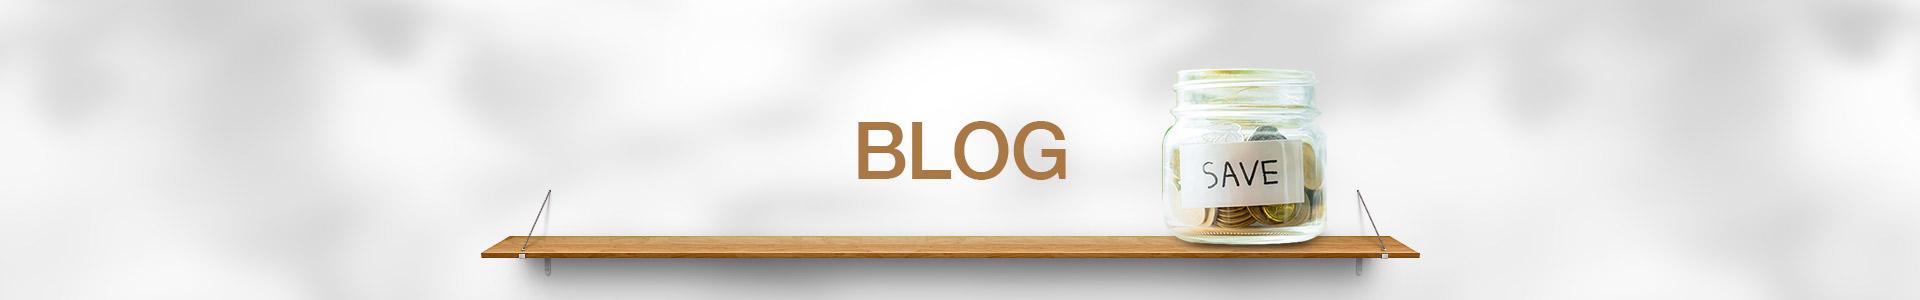 FPD_Blog_Banner